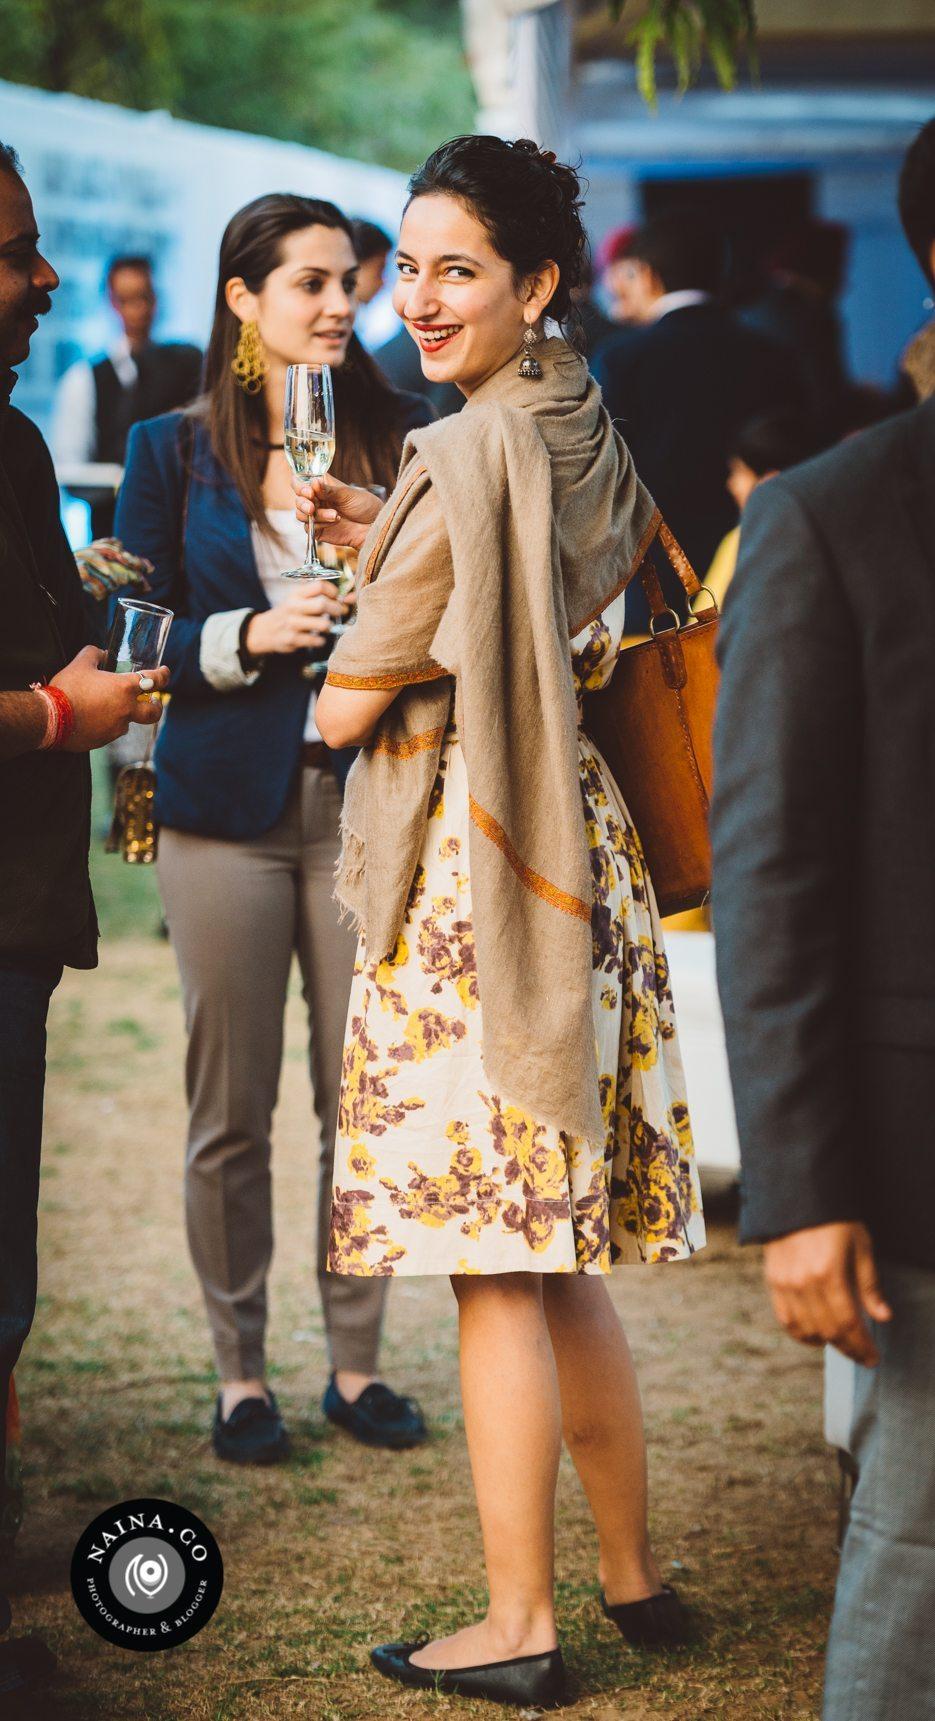 Naina.co-Raconteuse-Visuelle-Photographer-Blogger-Storyteller-Luxury-Lifestyle-January-2015-St.Regis-Polo-Cup-Maharaja-Jaipur-EyesForStreetStyle-20